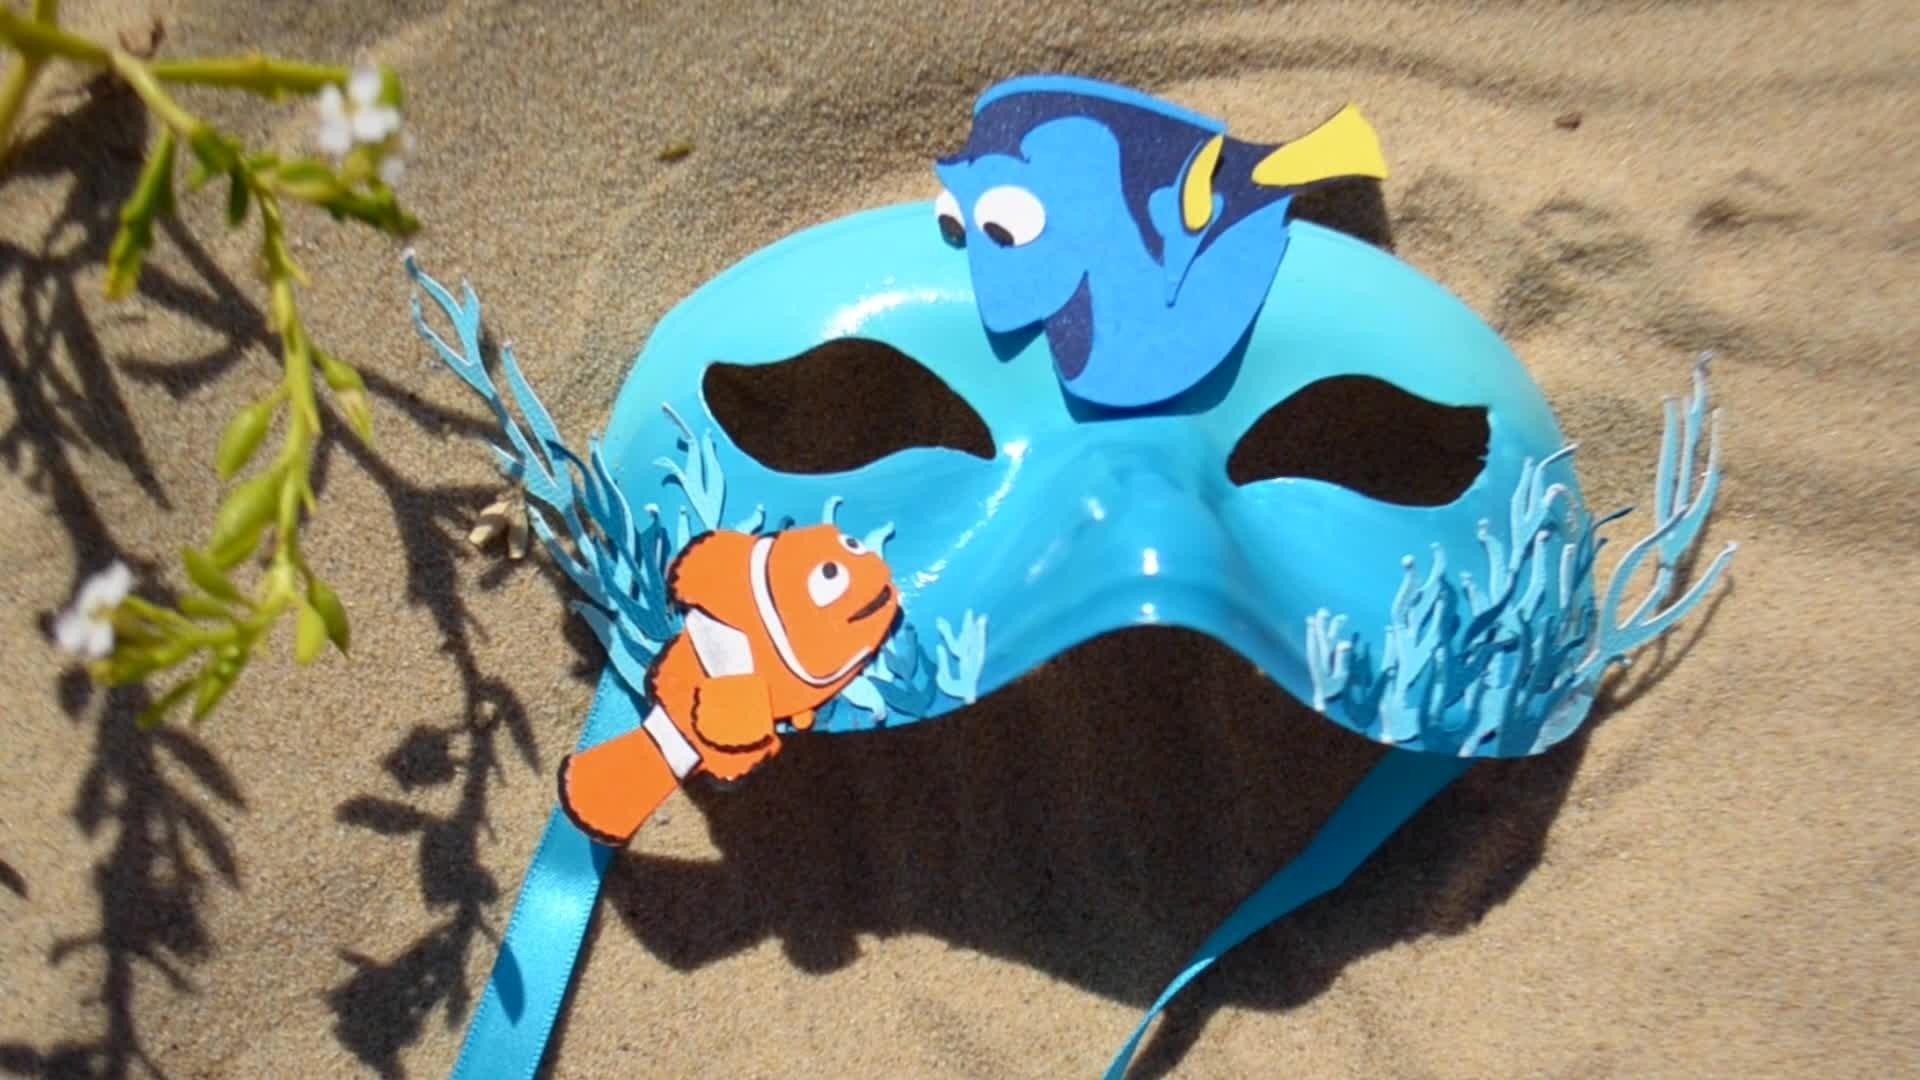 Le masque Nemo et Dory